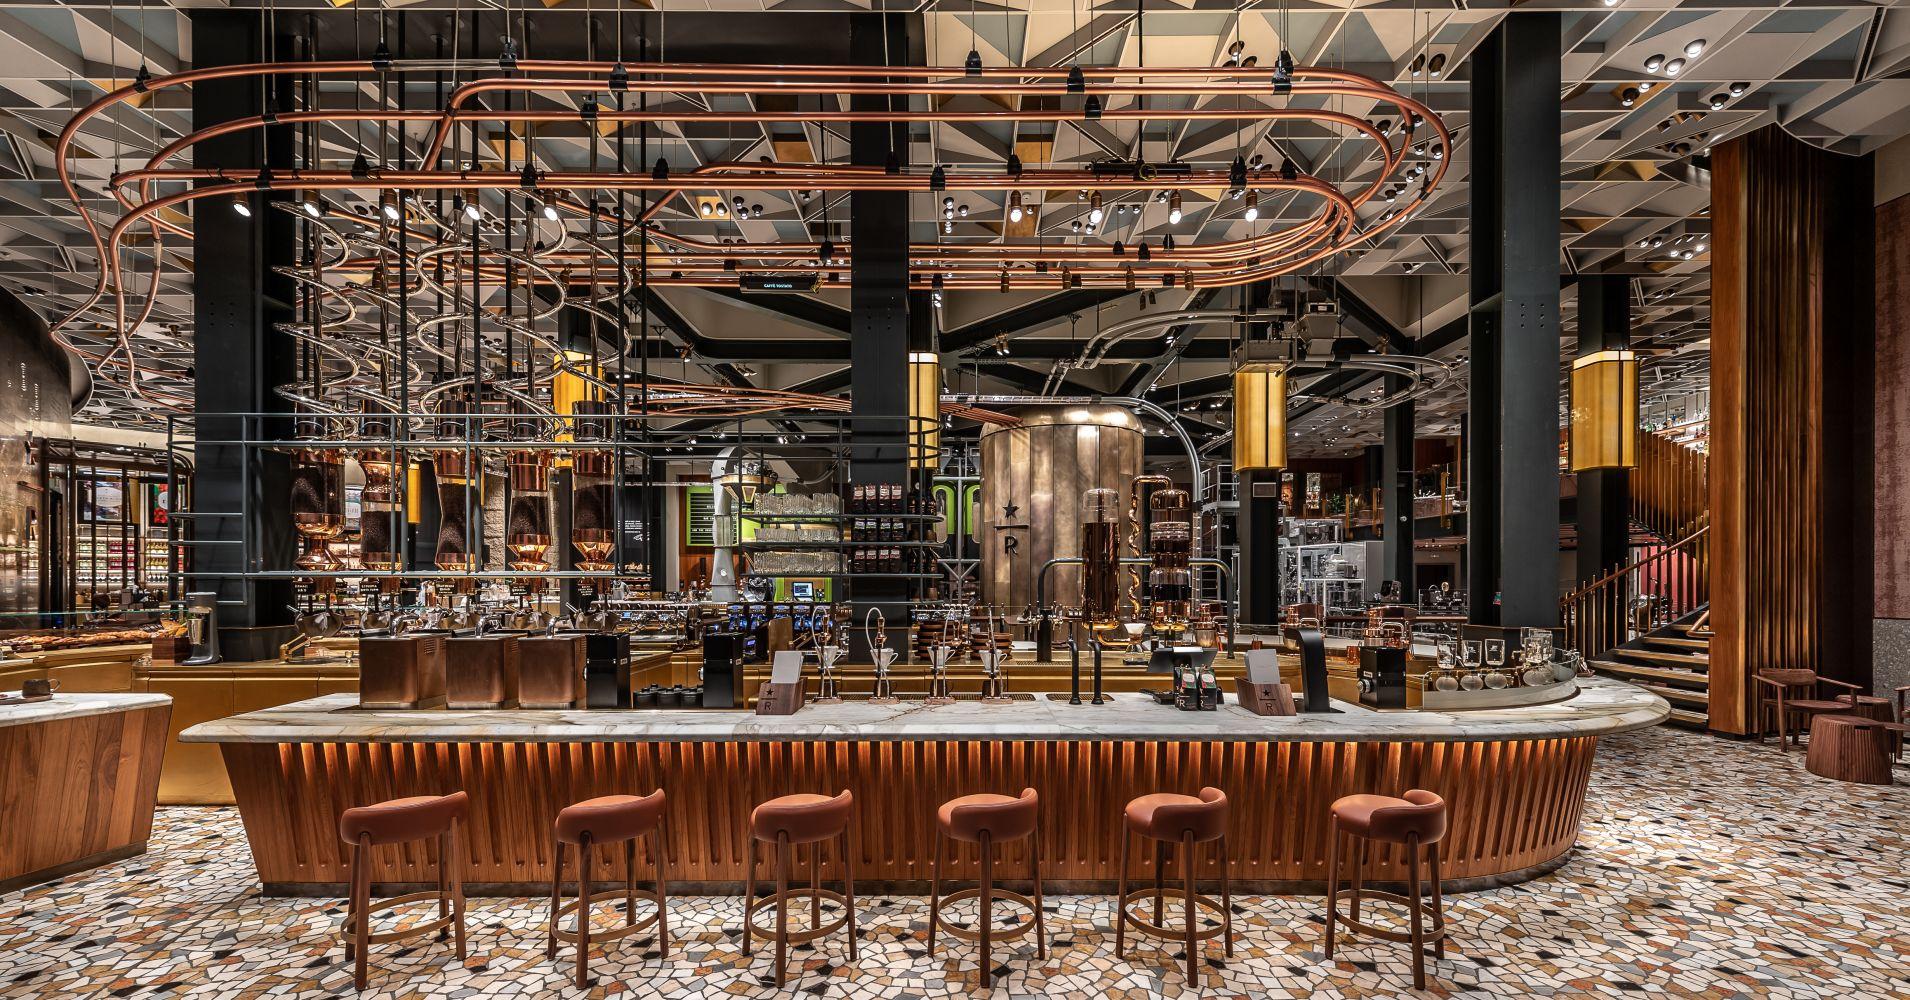 Esternidesign.it - Interior Starbucks Reserve Roastery